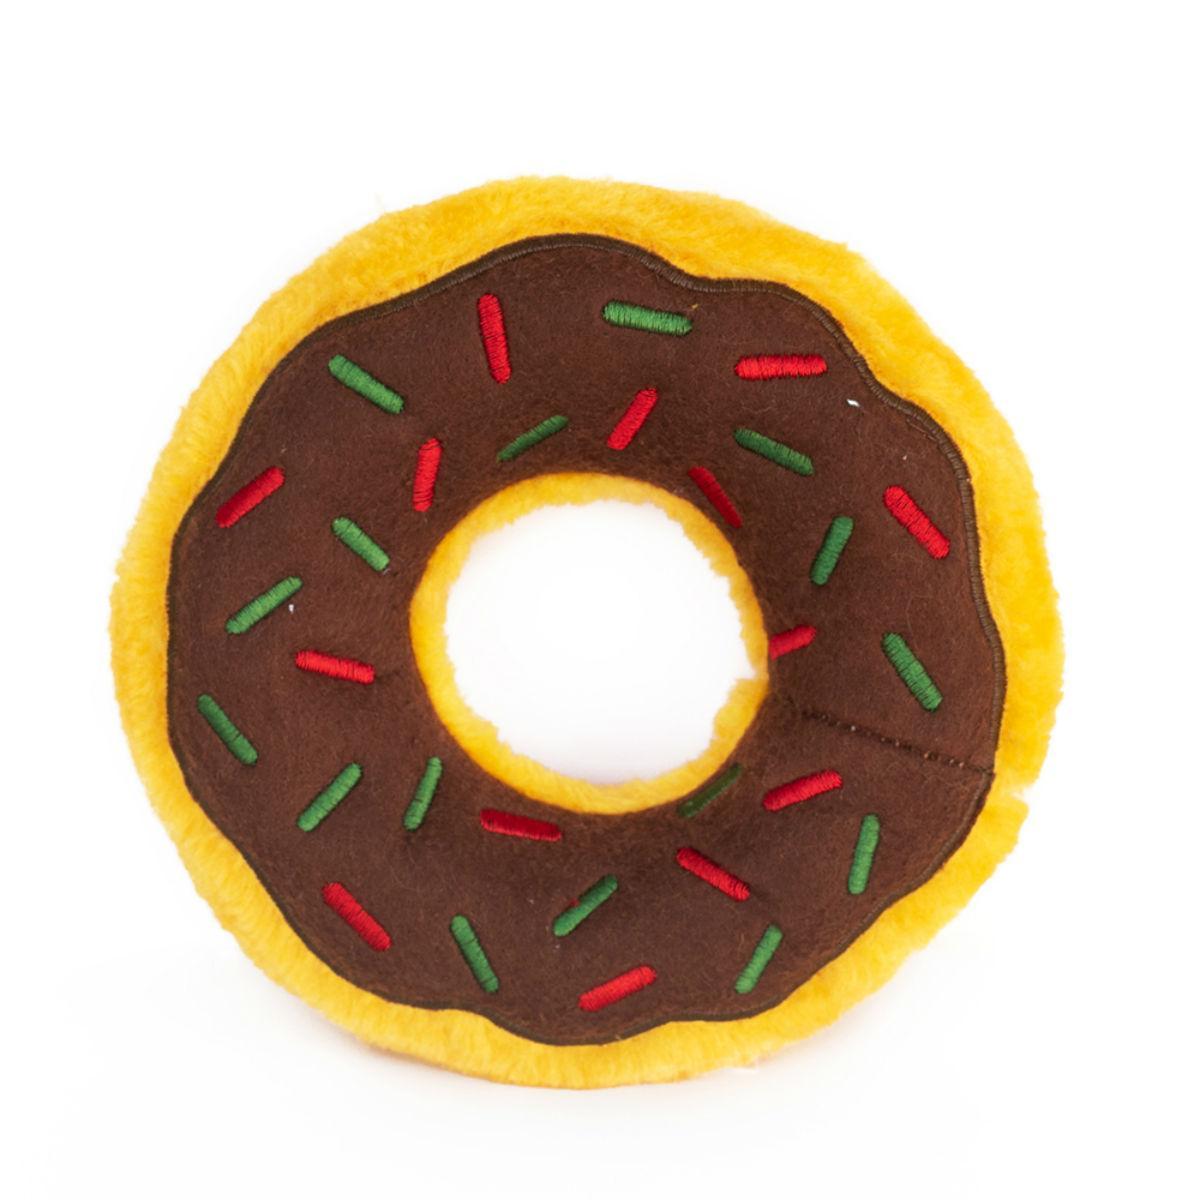 ZippyPaws Holiday Donutz Dog Toy - Gingerbread